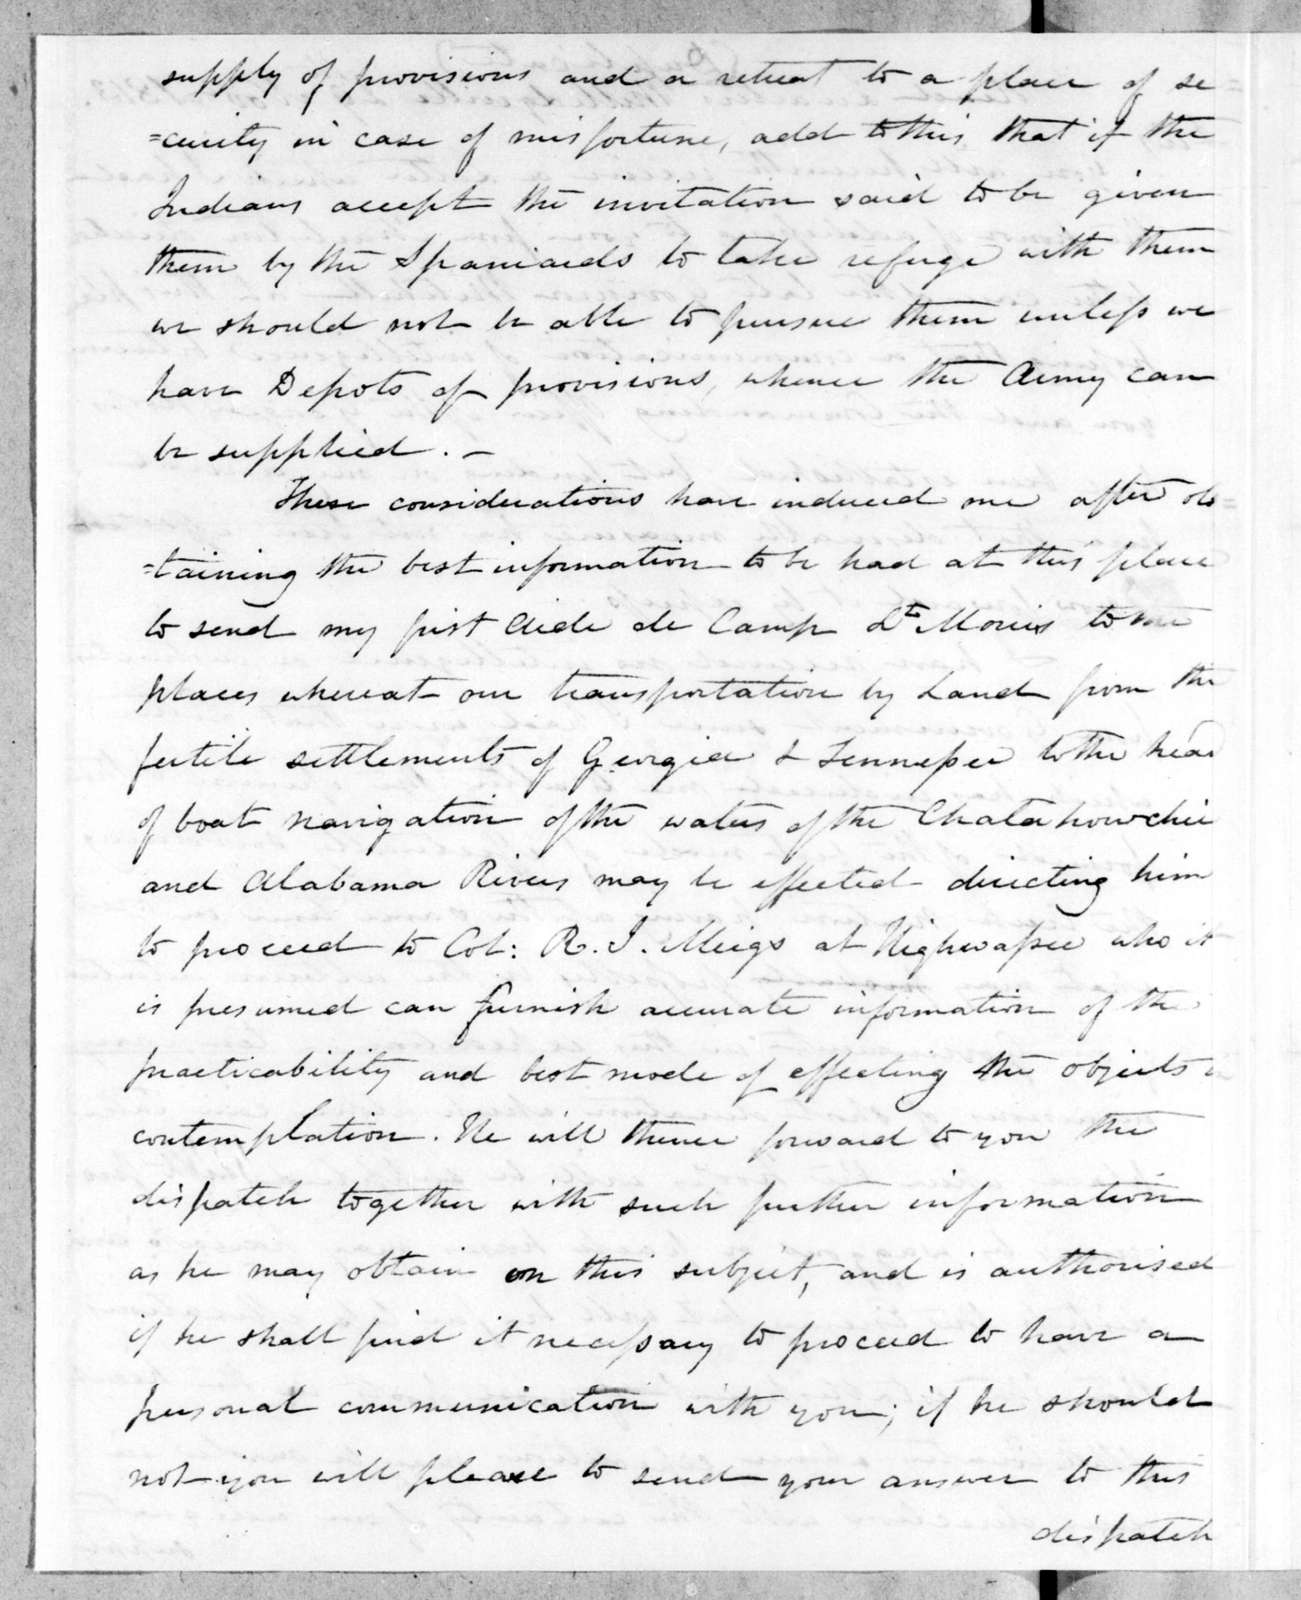 Thomas Pinckney to Andrew Jackson, November 29, 1813